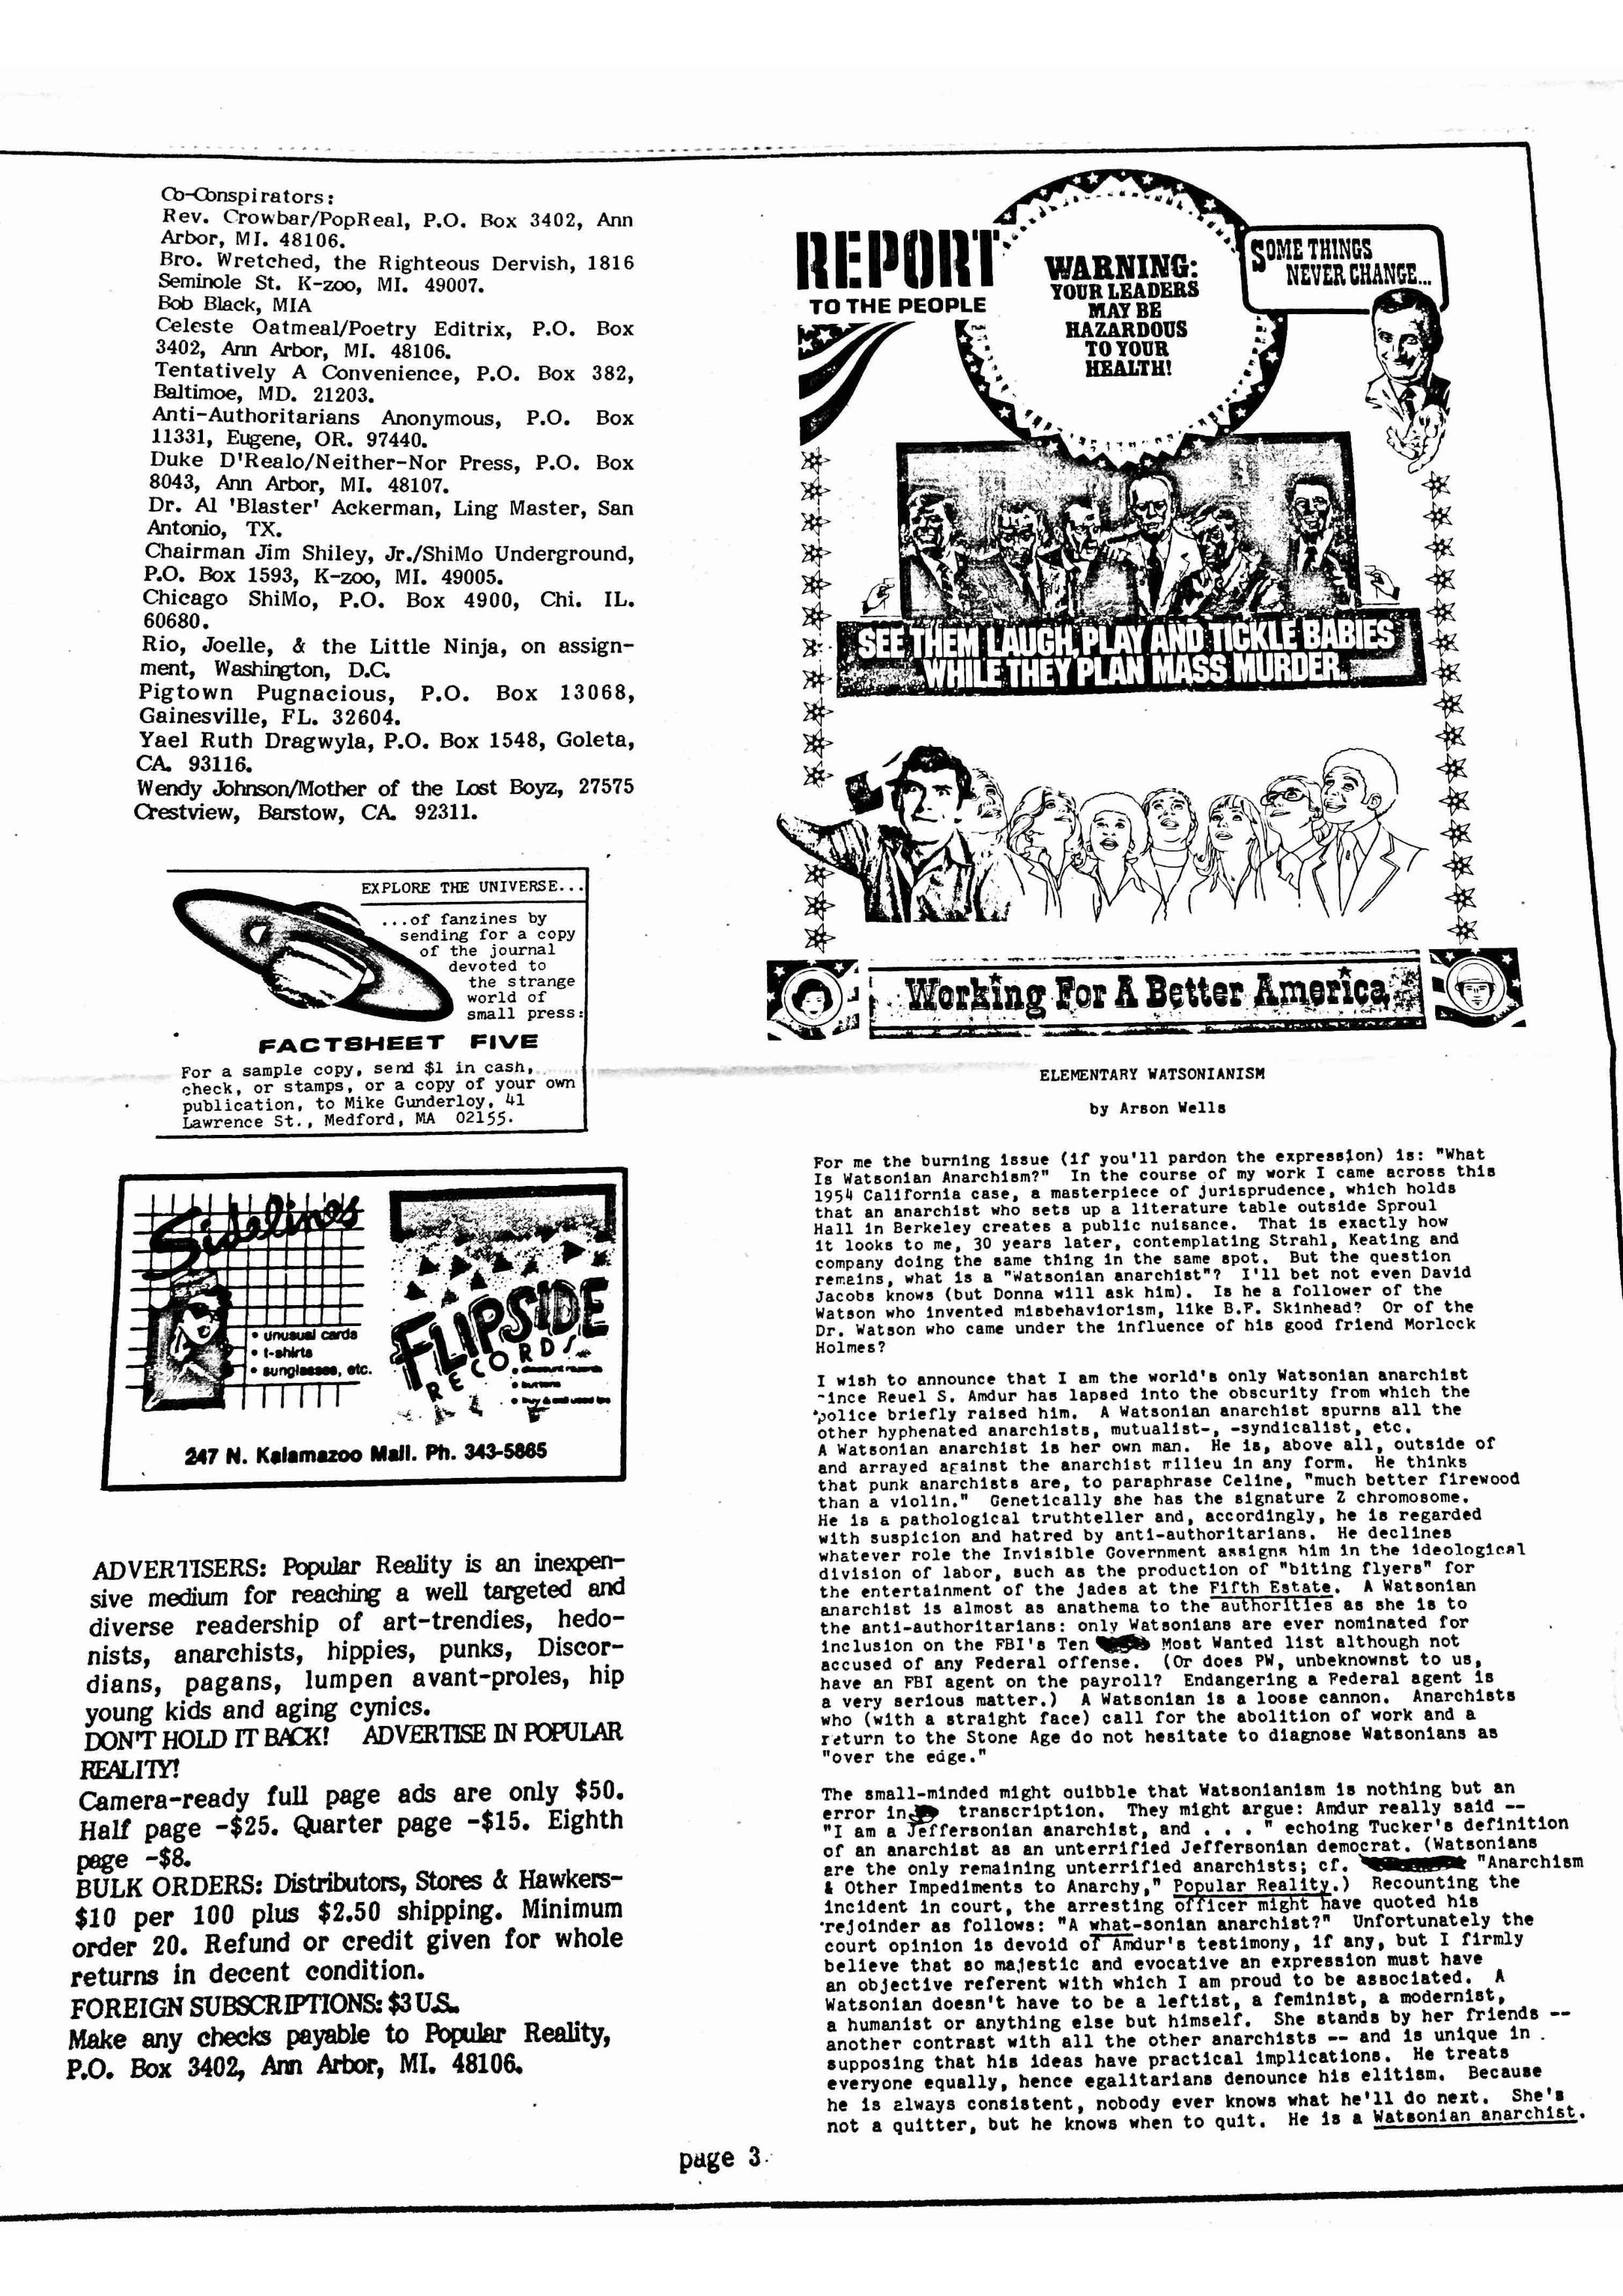 PopRealNo9-page-003.jpg